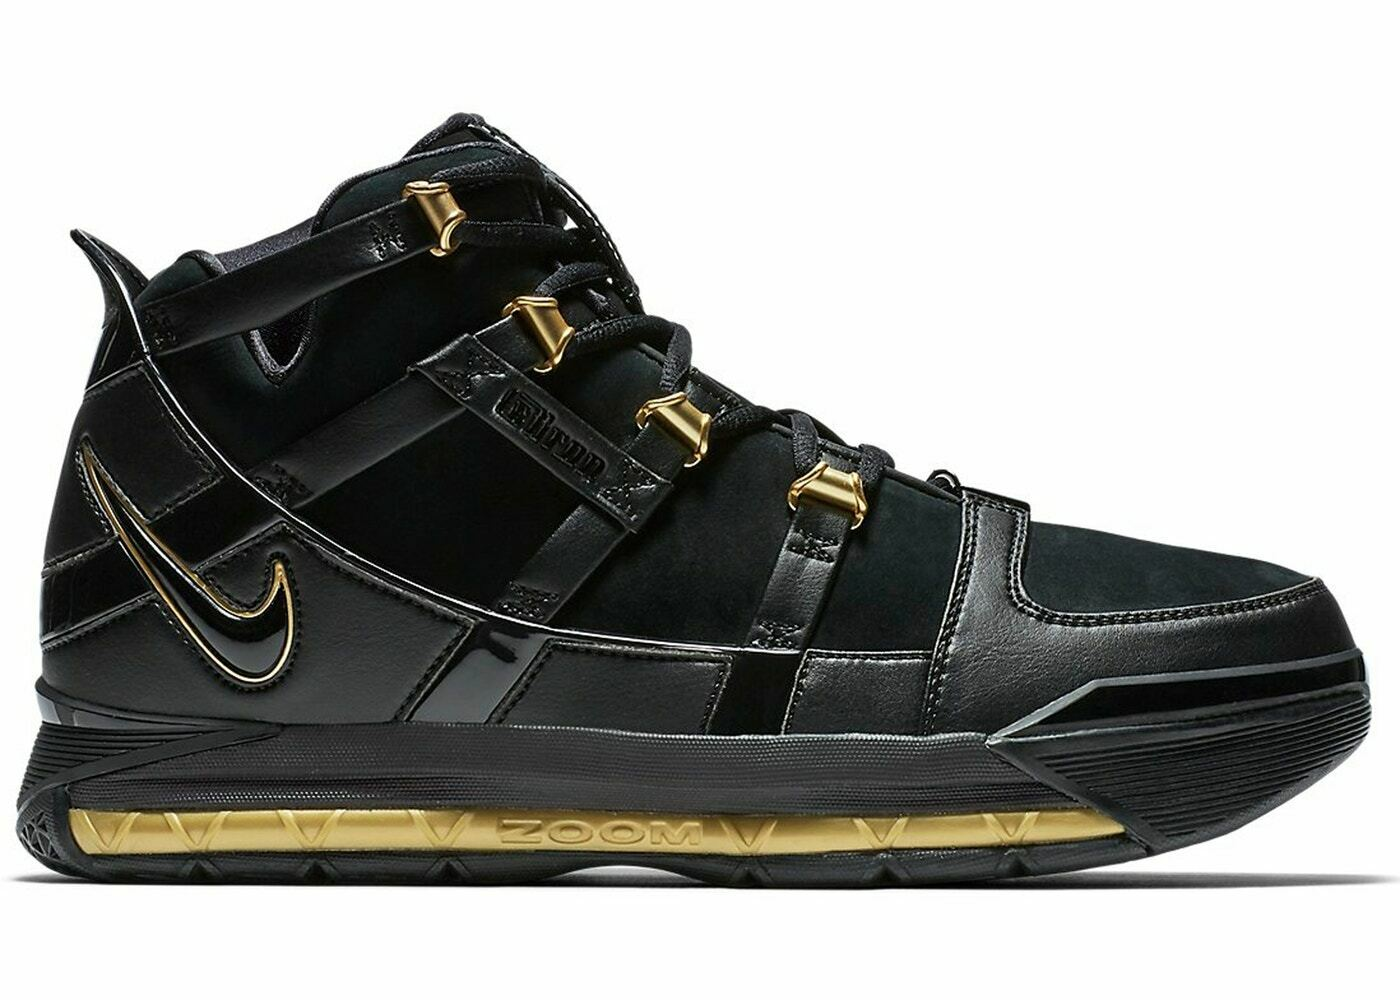 2018 Nike LeBron 3 III Black gold Size 14. AO2434-001